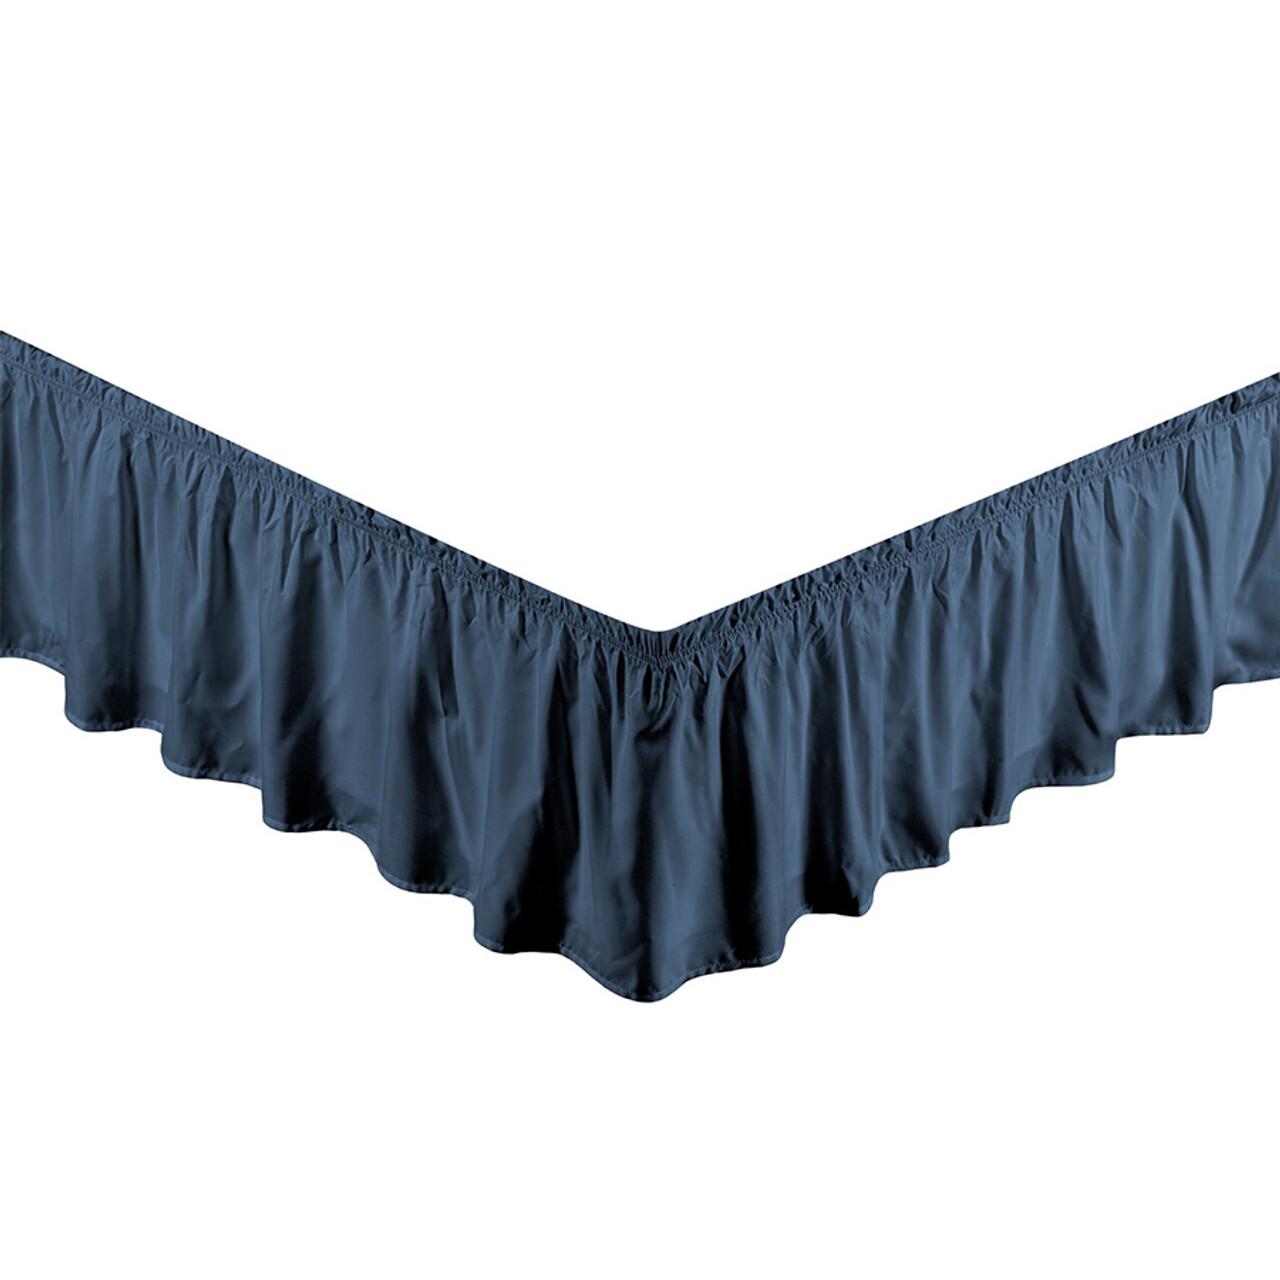 "Navy Bed Skirt Dust Ruffle 100% Brushed Microfiber with 14"" Drop in USA, California, New York, New York City, Los Angeles, San Francisco, Pennsylvania, Washington DC, Virginia, Maryland"